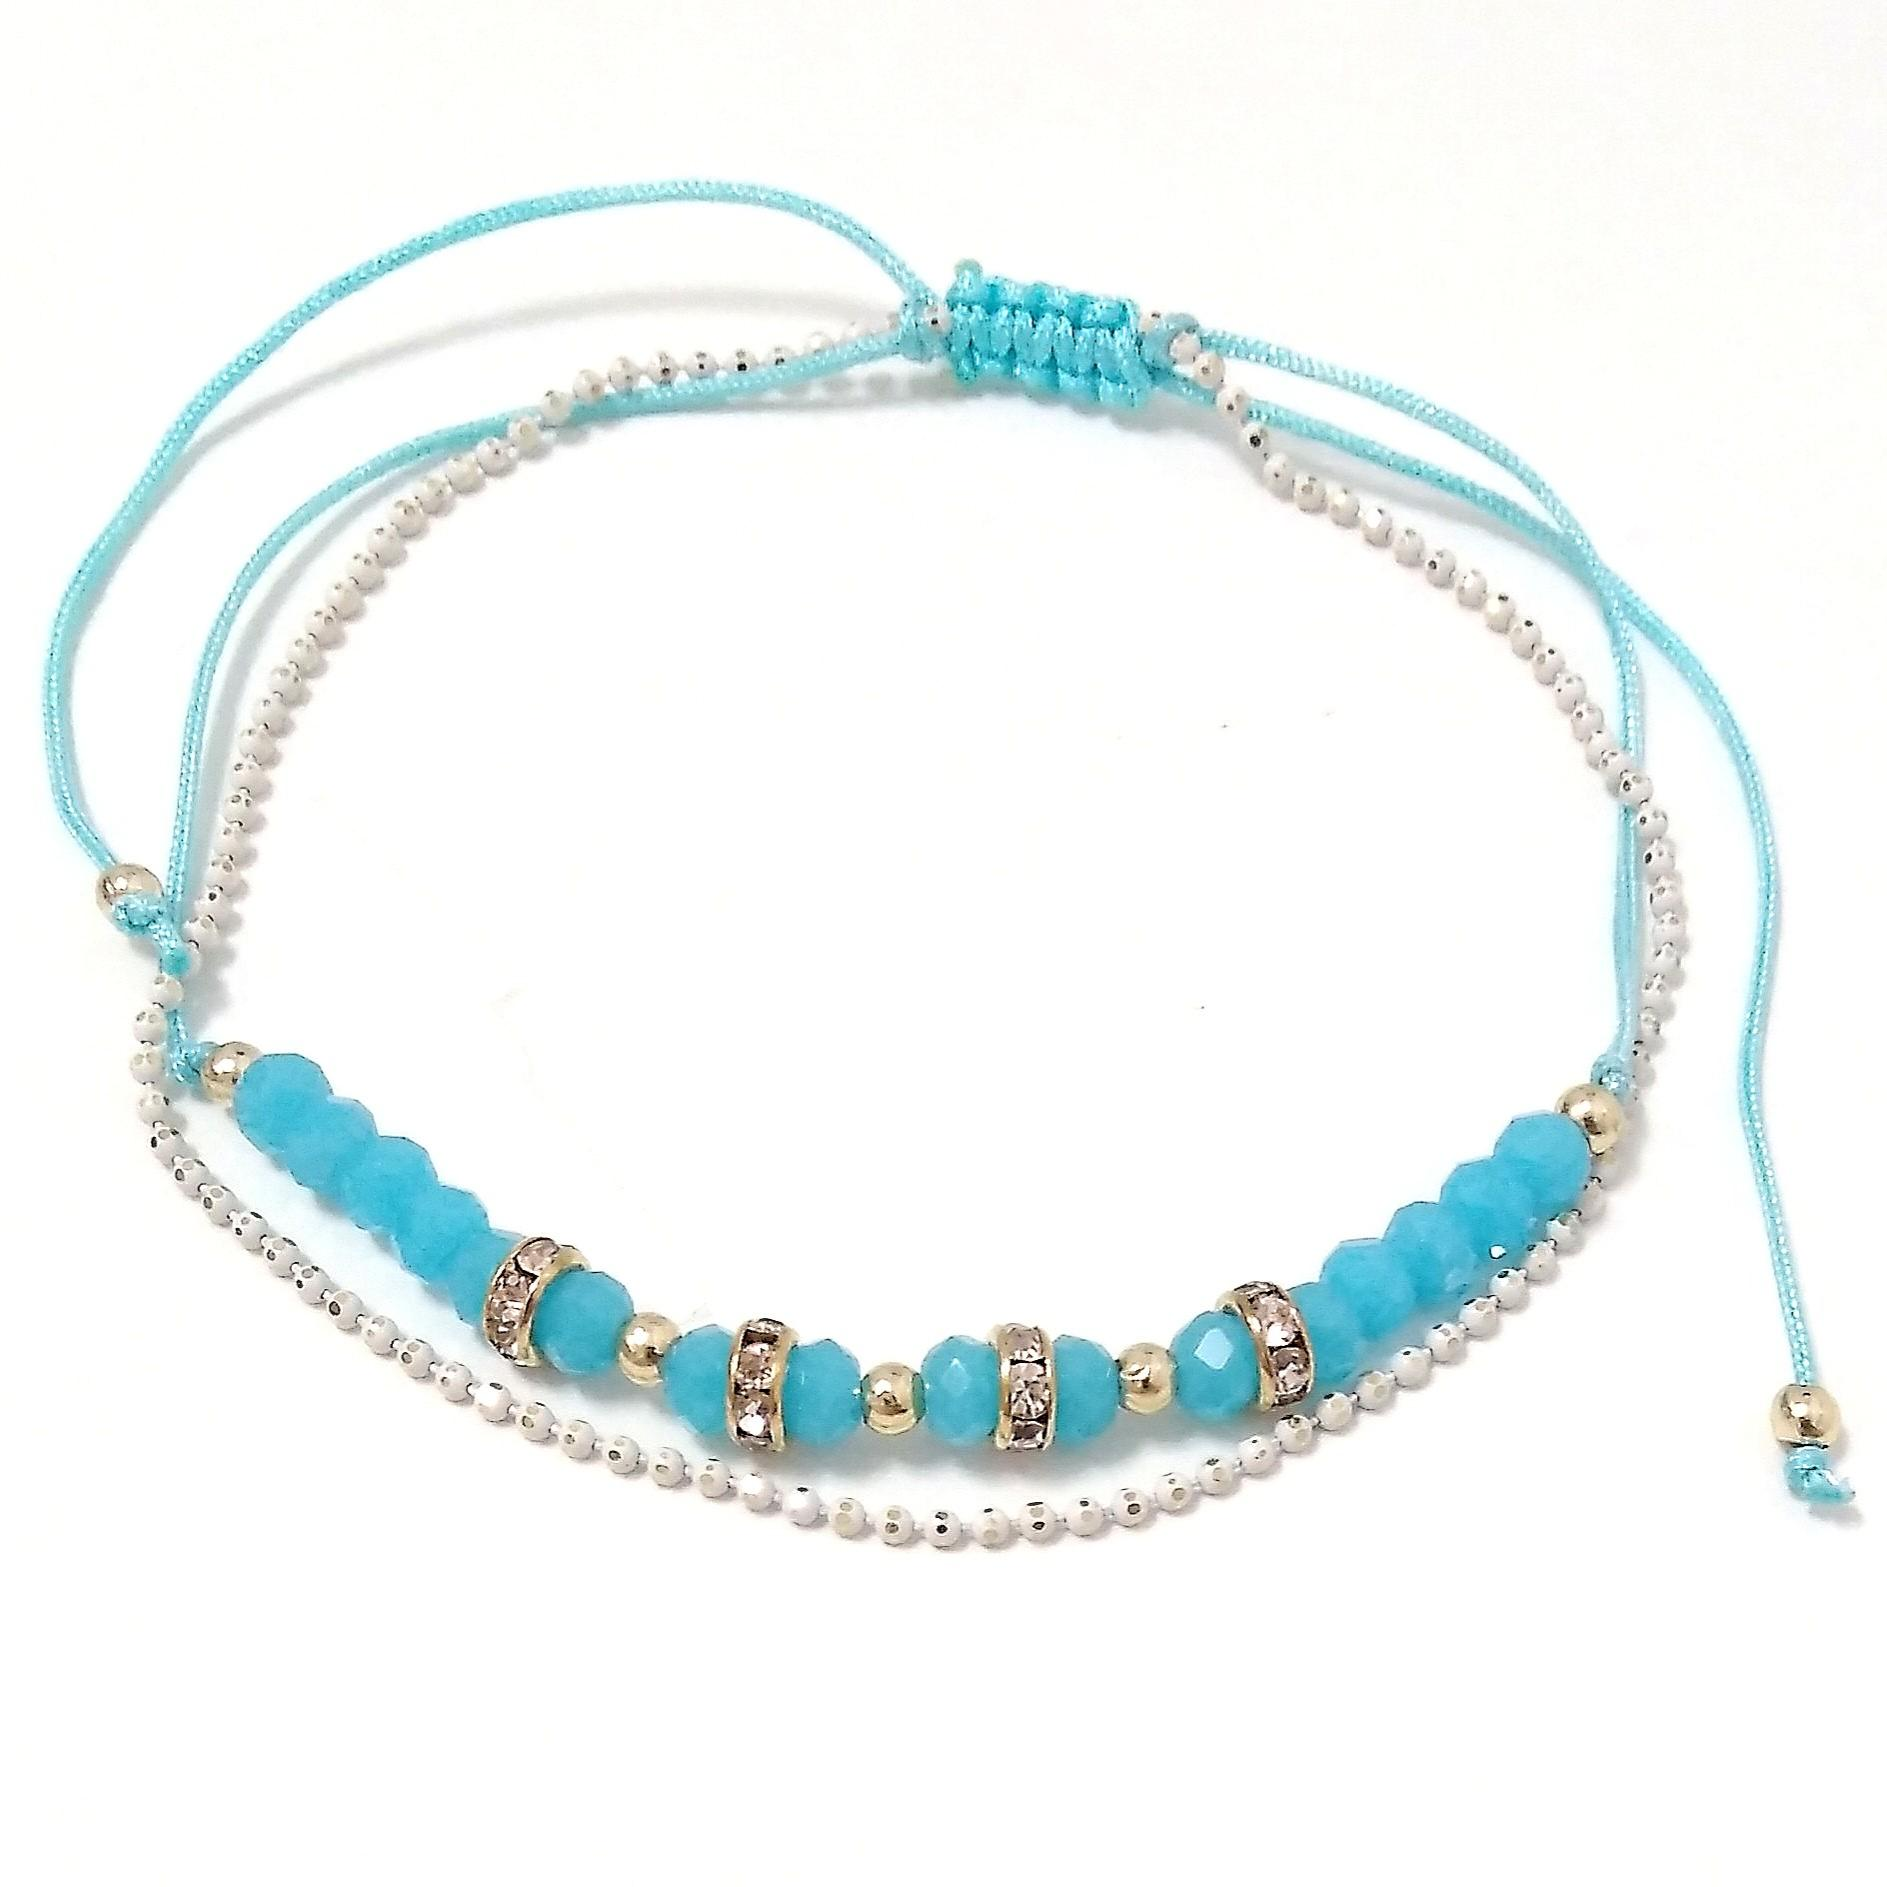 Tobillera hilo color azul turquesa